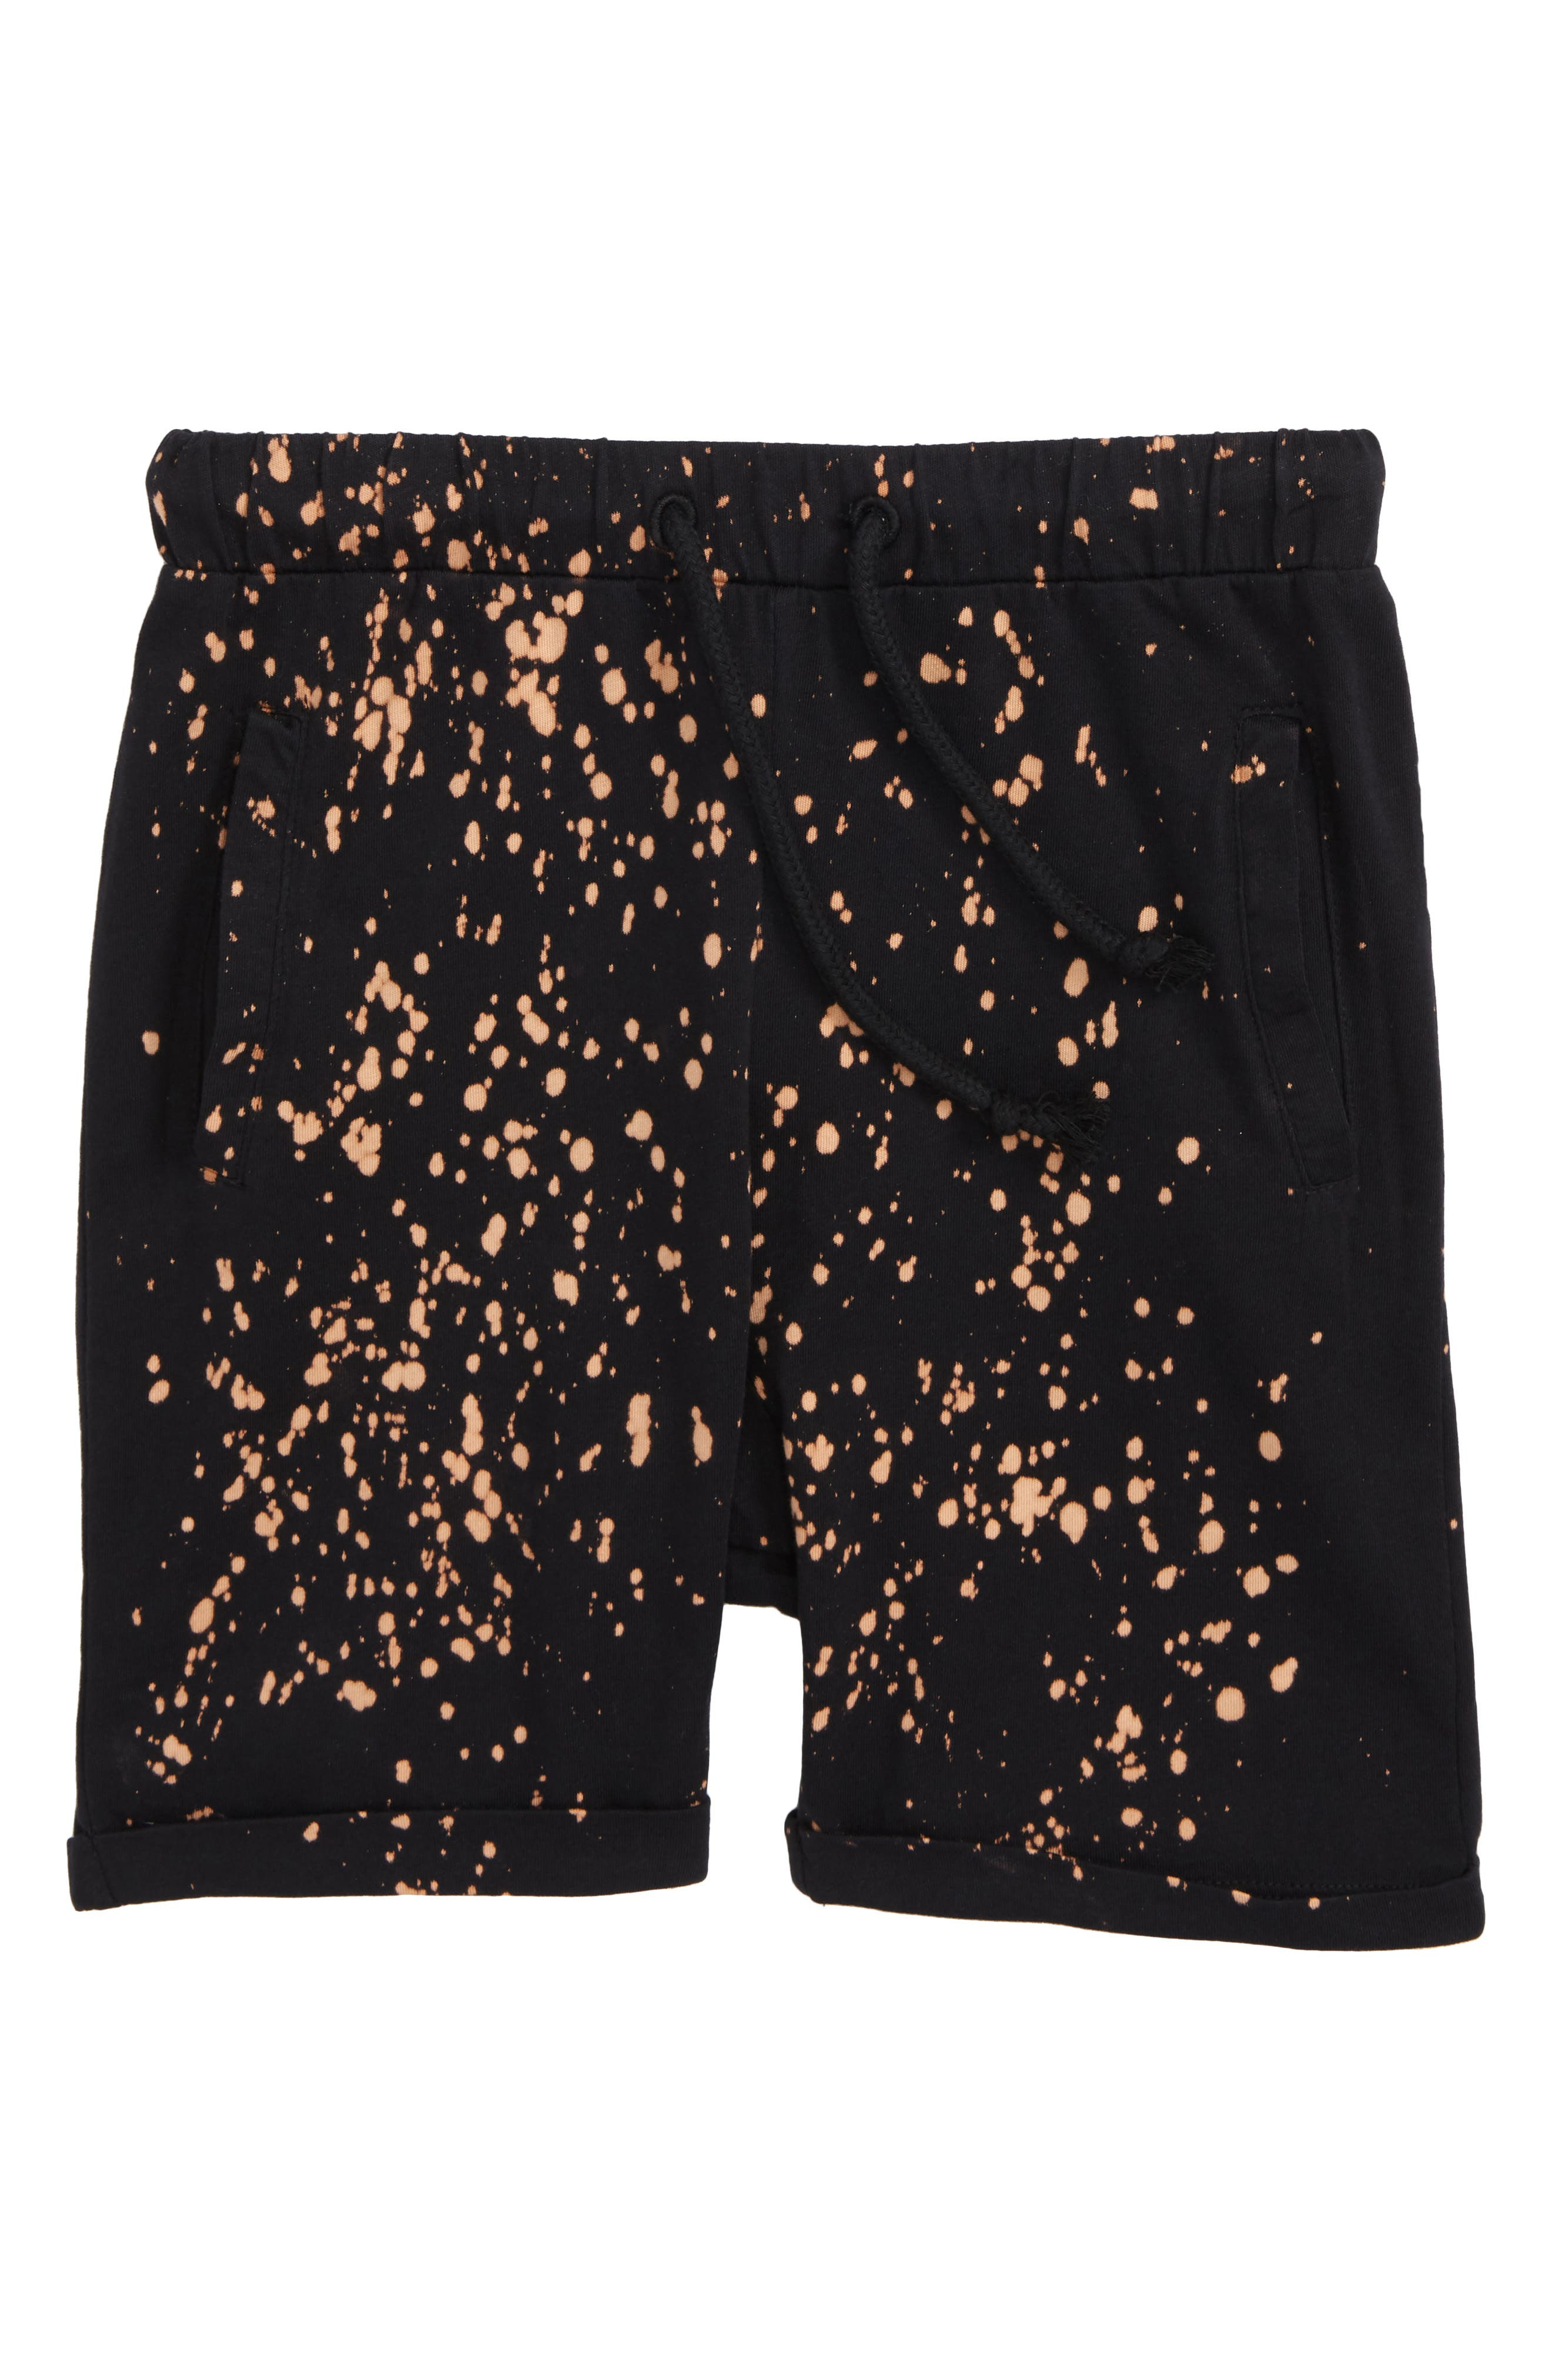 Avalon Knit Shorts,                         Main,                         color, Black